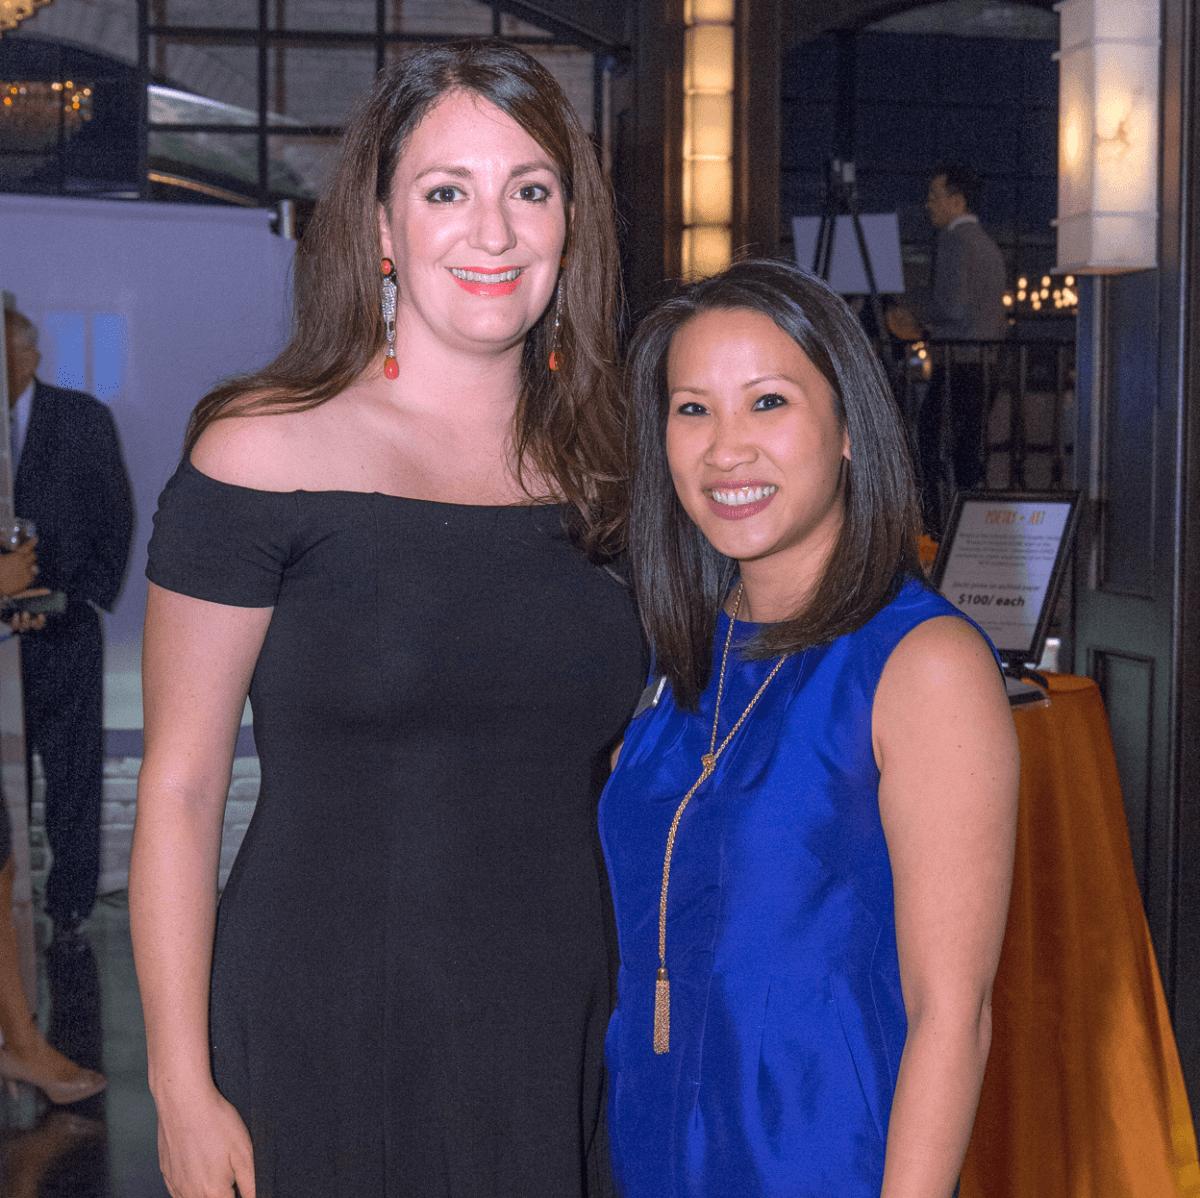 Houston, Writers in the Schools gala, Dec 2016, Mitra Woody, Julie Tran